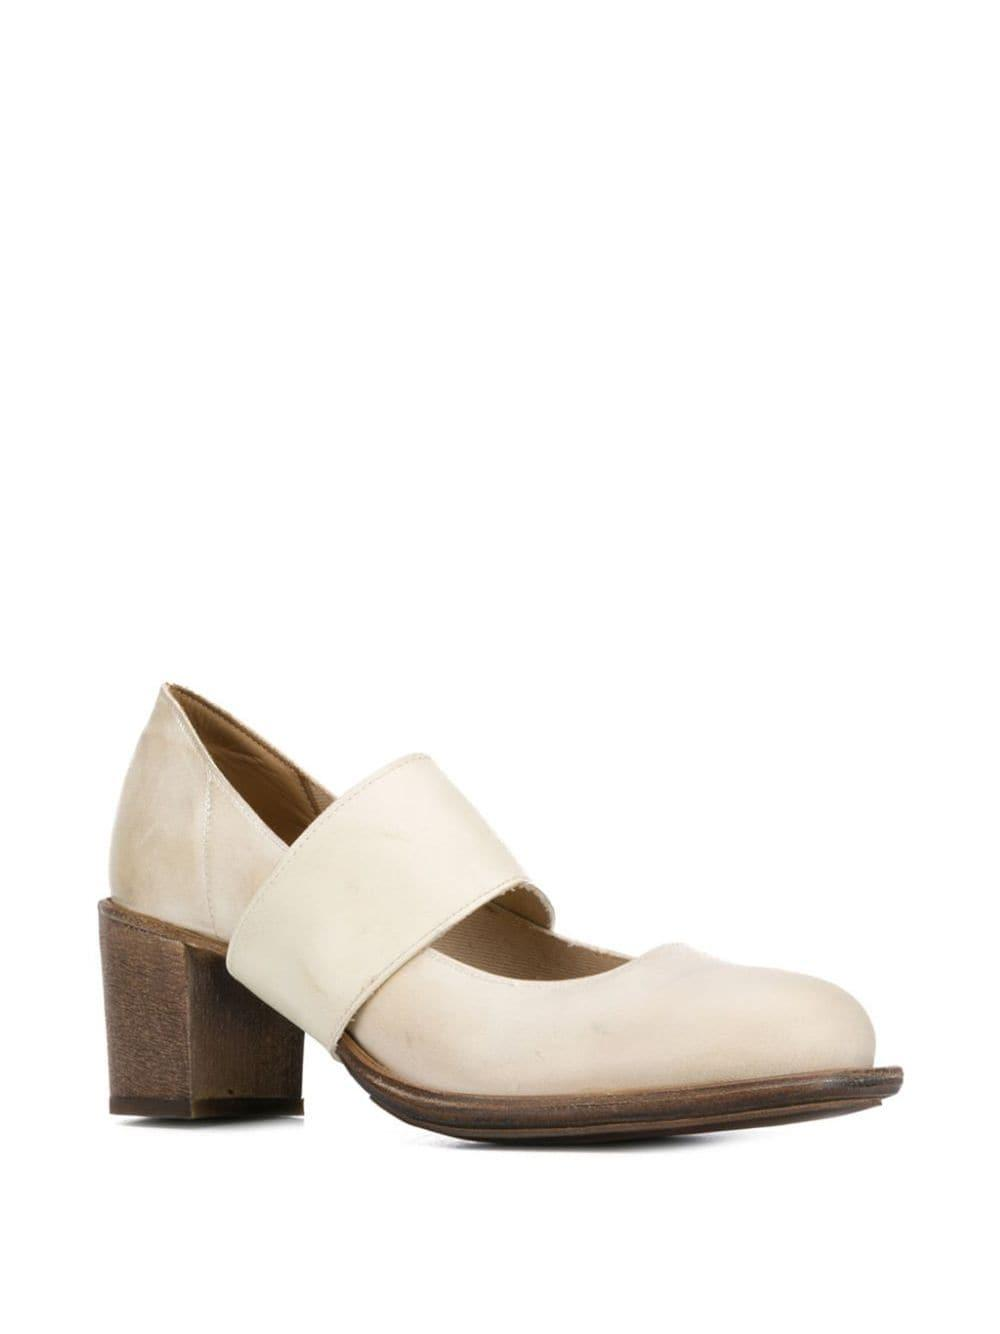 Zapatos de tacón Blake Cherevichkiotvichki de Cuero de color Blanco